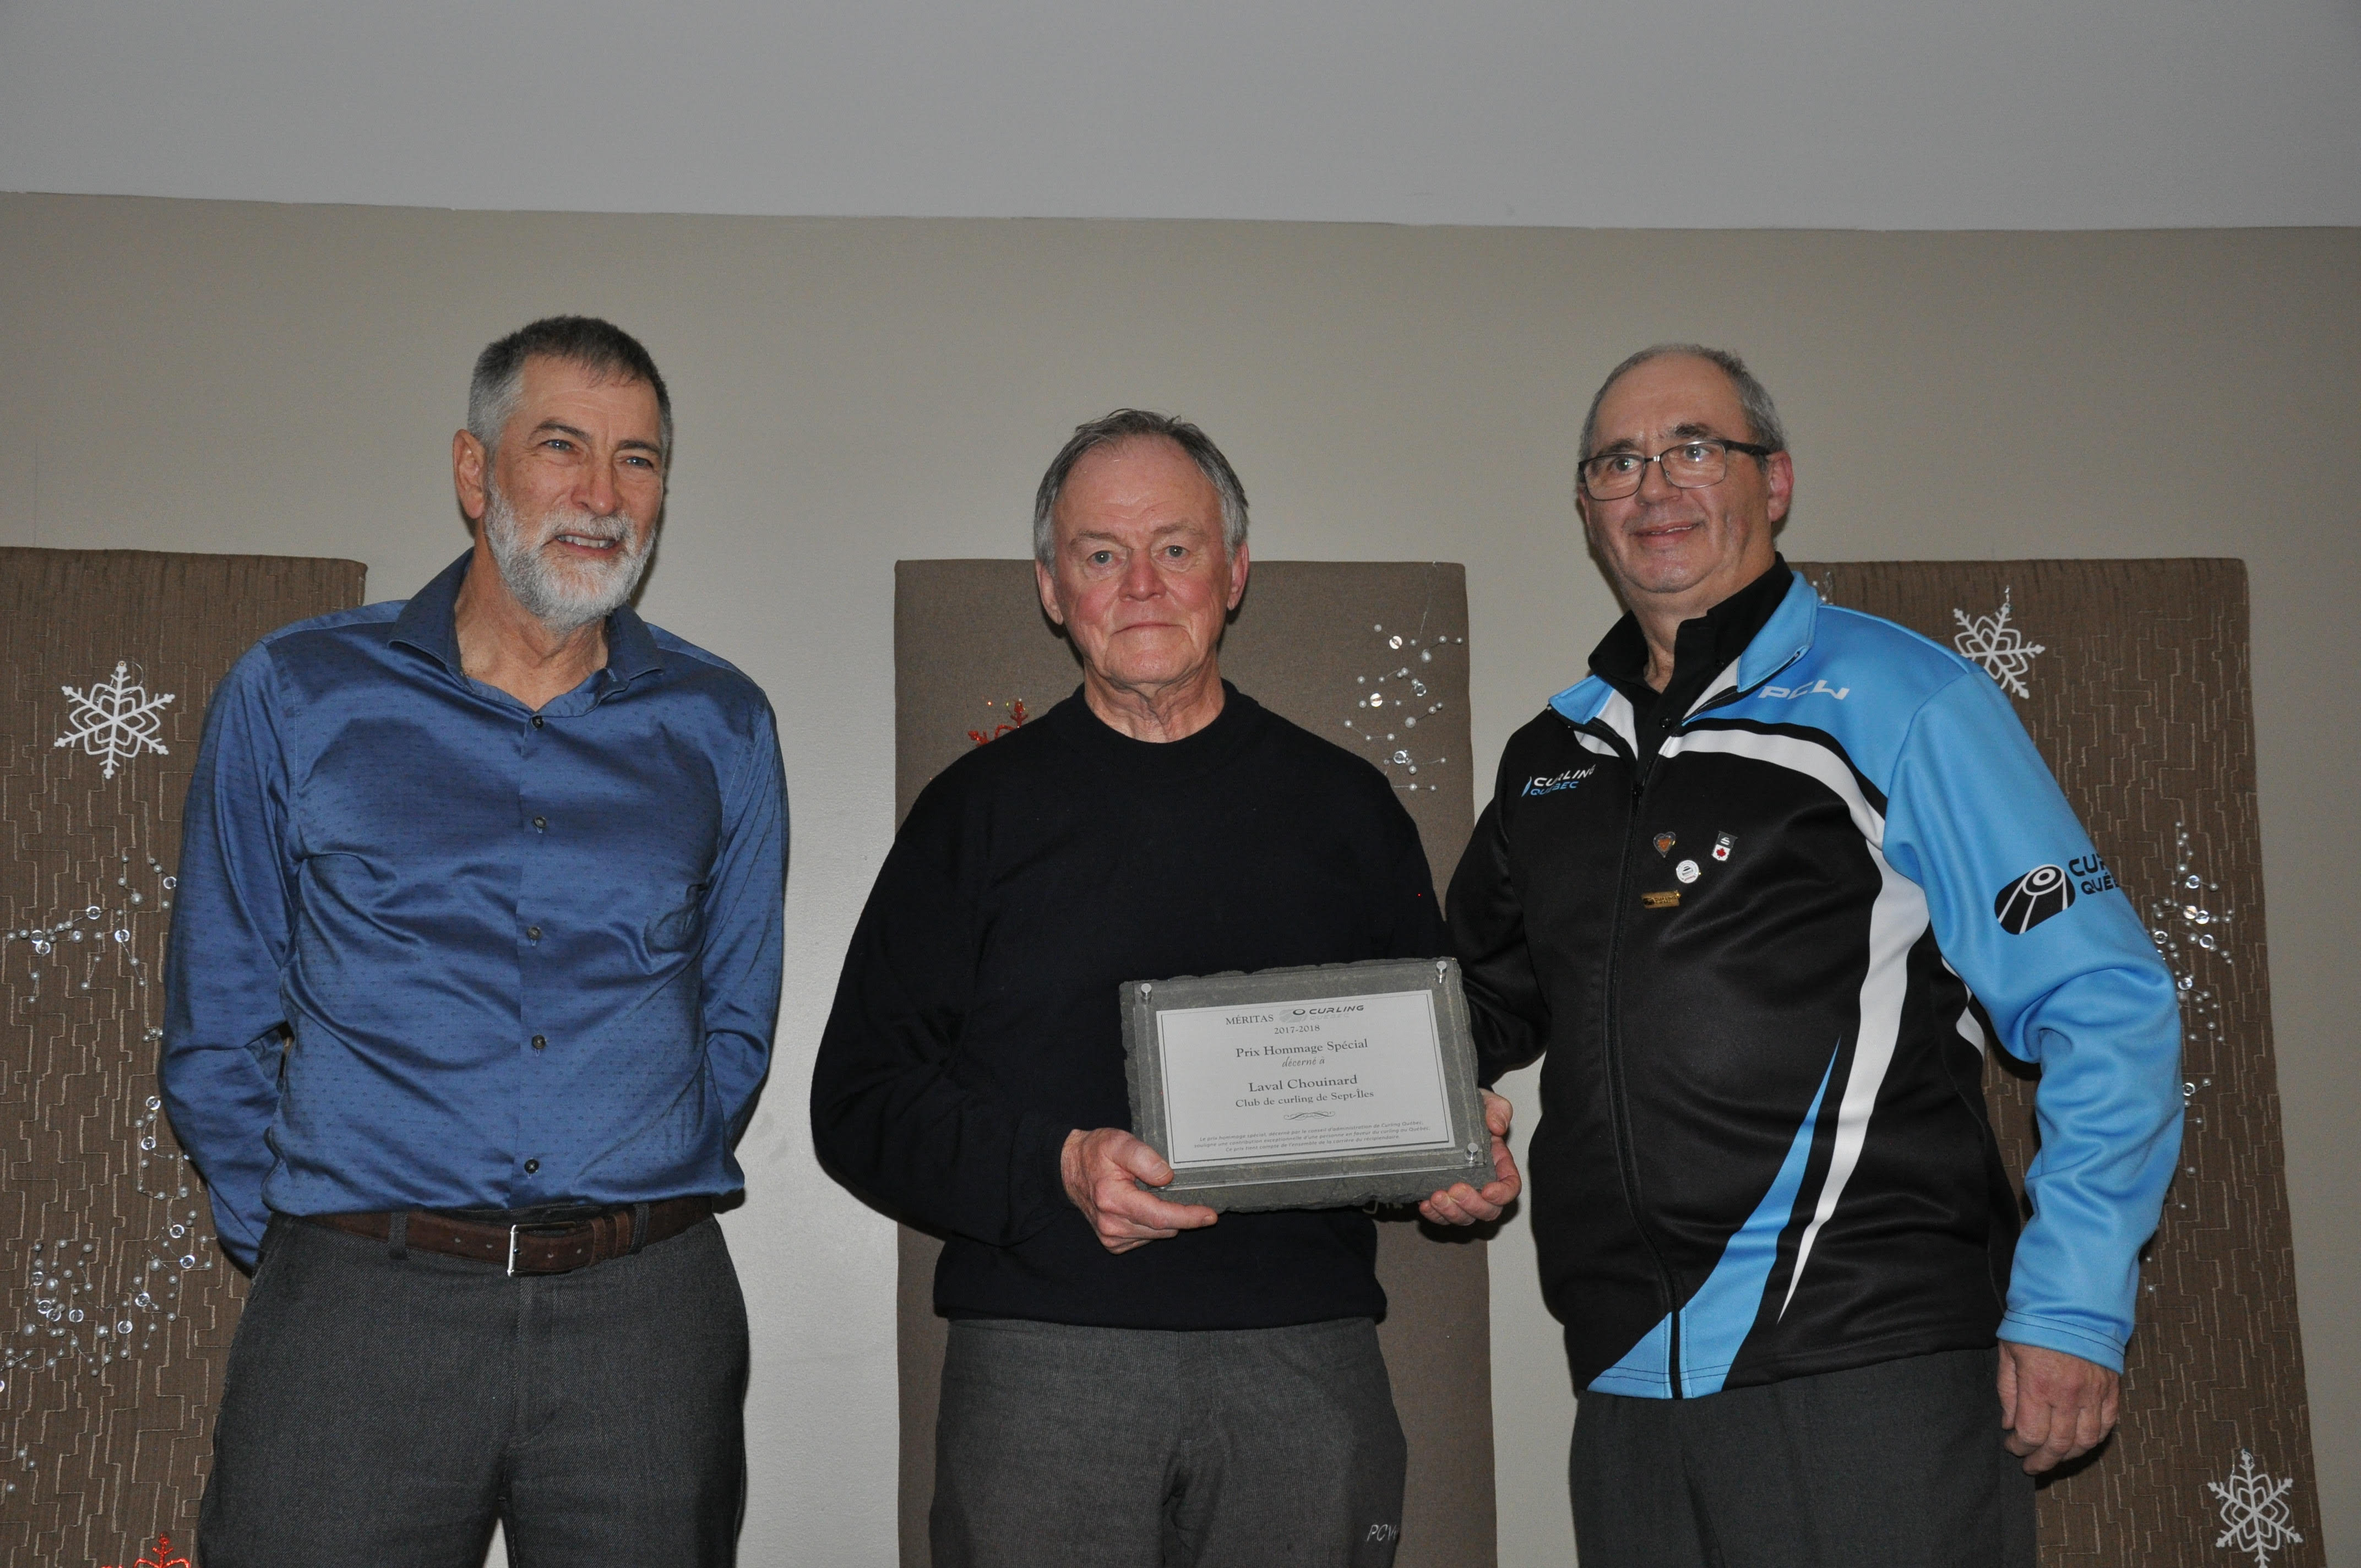 Special Tribute Meritas Award Curling Québec